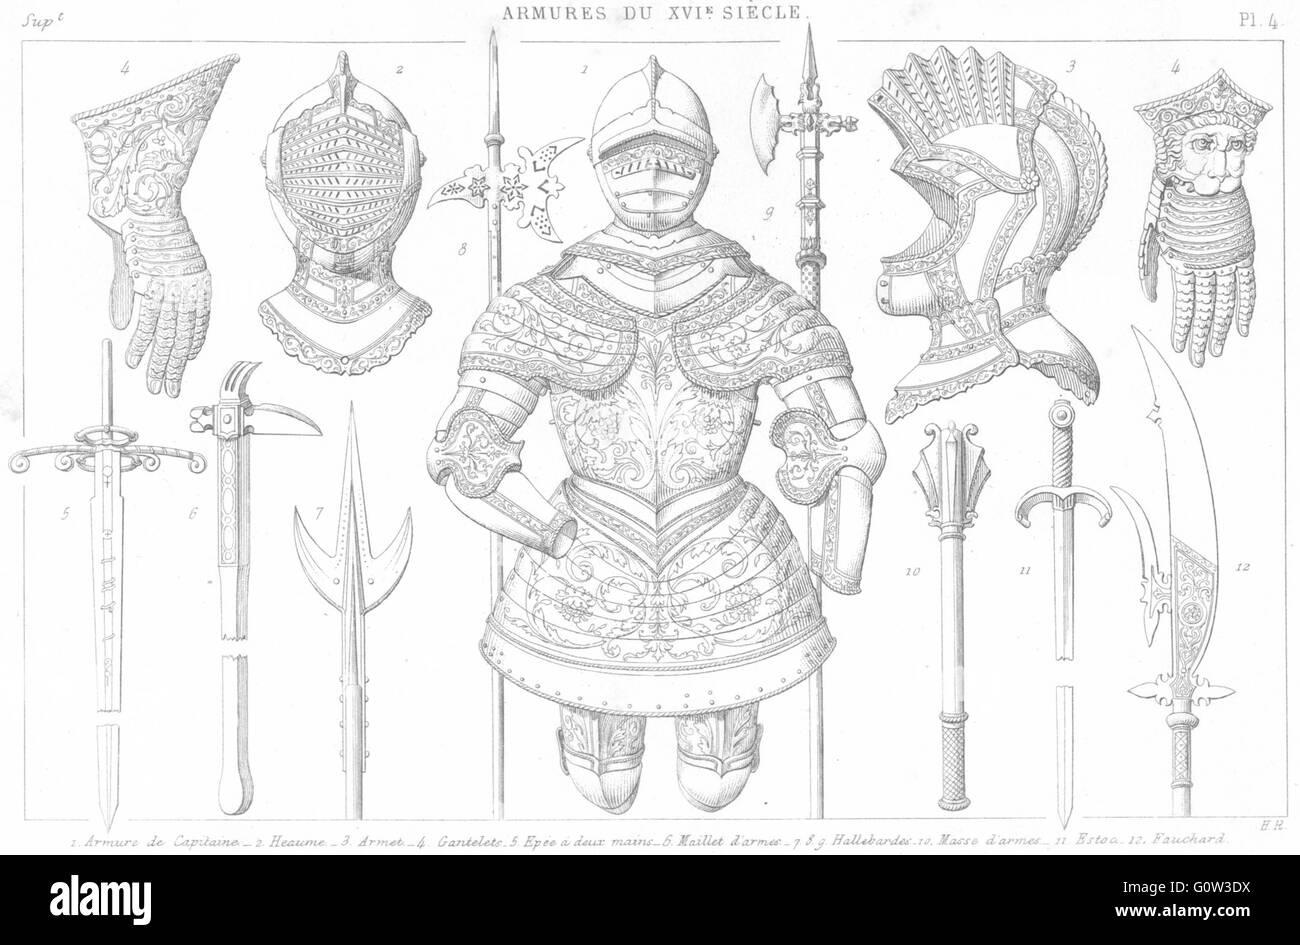 16C Anzug Rüstung: Helm; Armet; Handschuh; Schwert; Hammer; Hellebarde; Fauchard, 1875 Stockbild